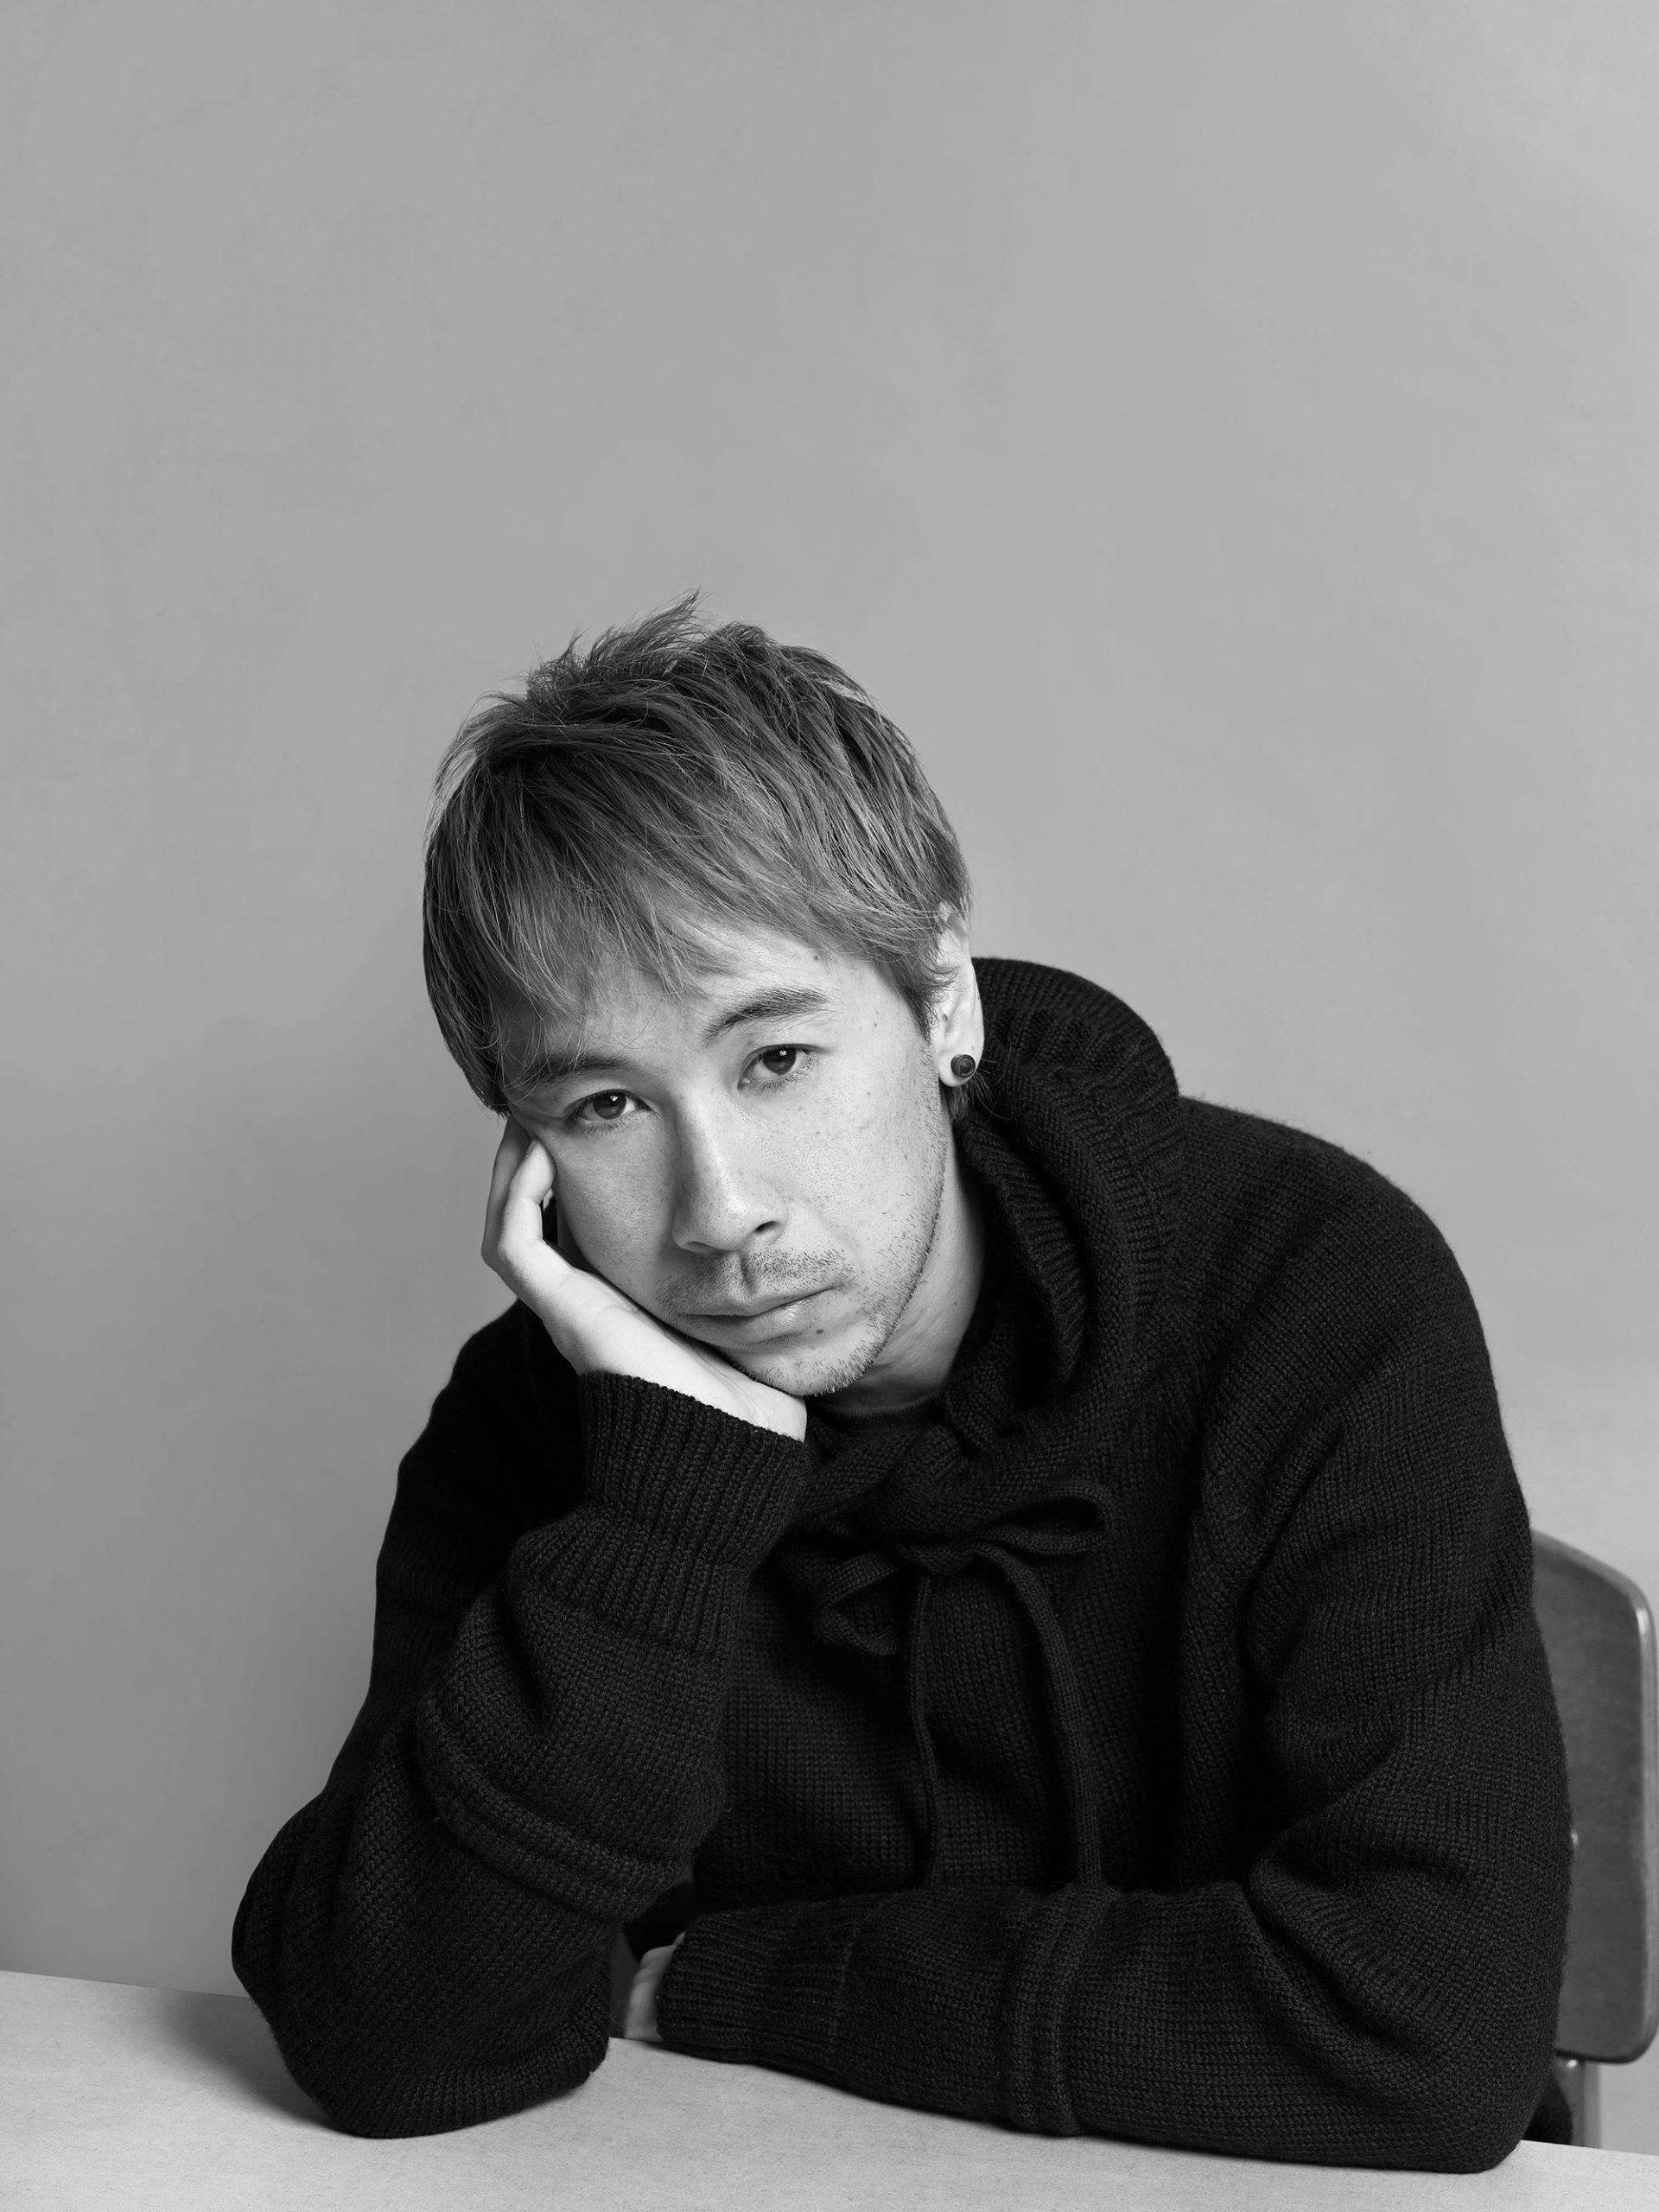 Photography: Yoshie Tominaga